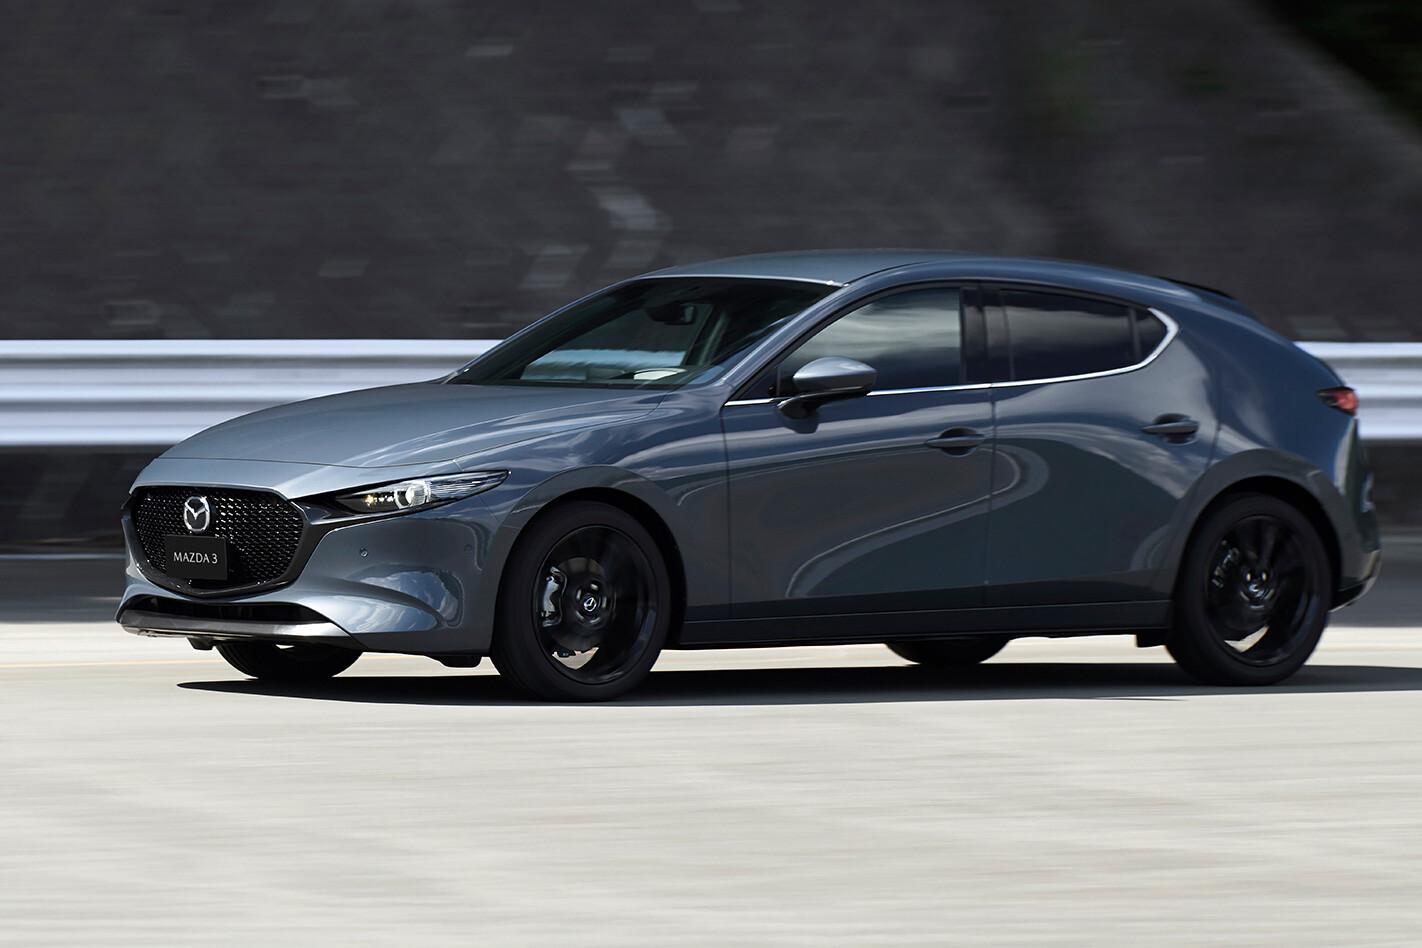 Mazda 3 Driving Jpg